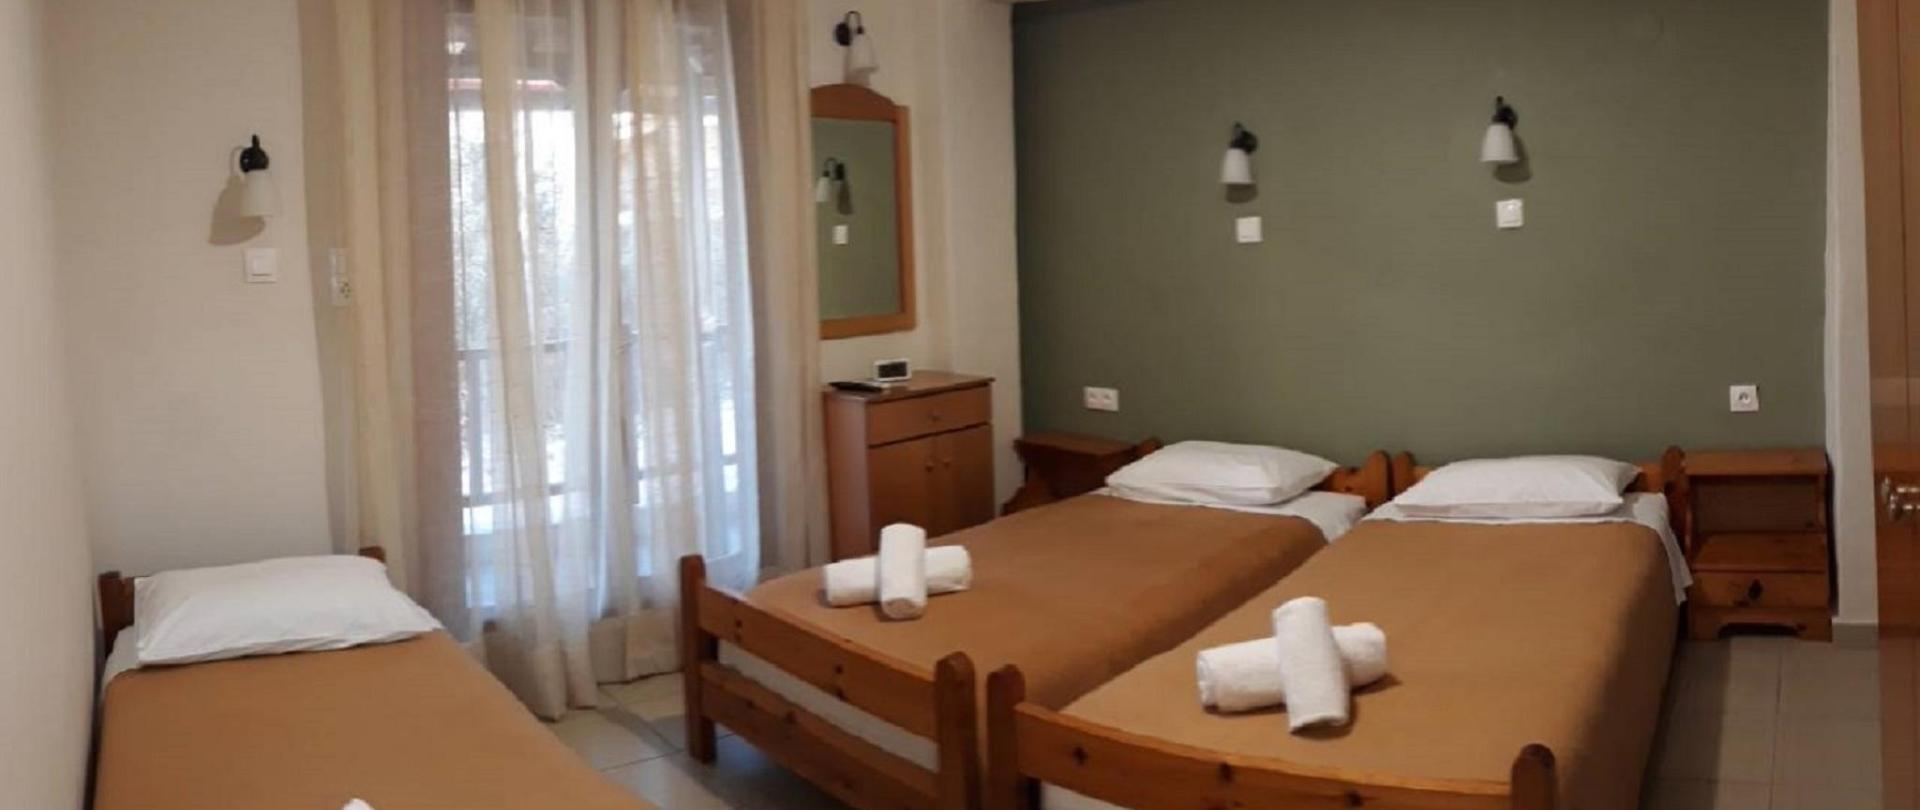 room_panorama1a.jpg